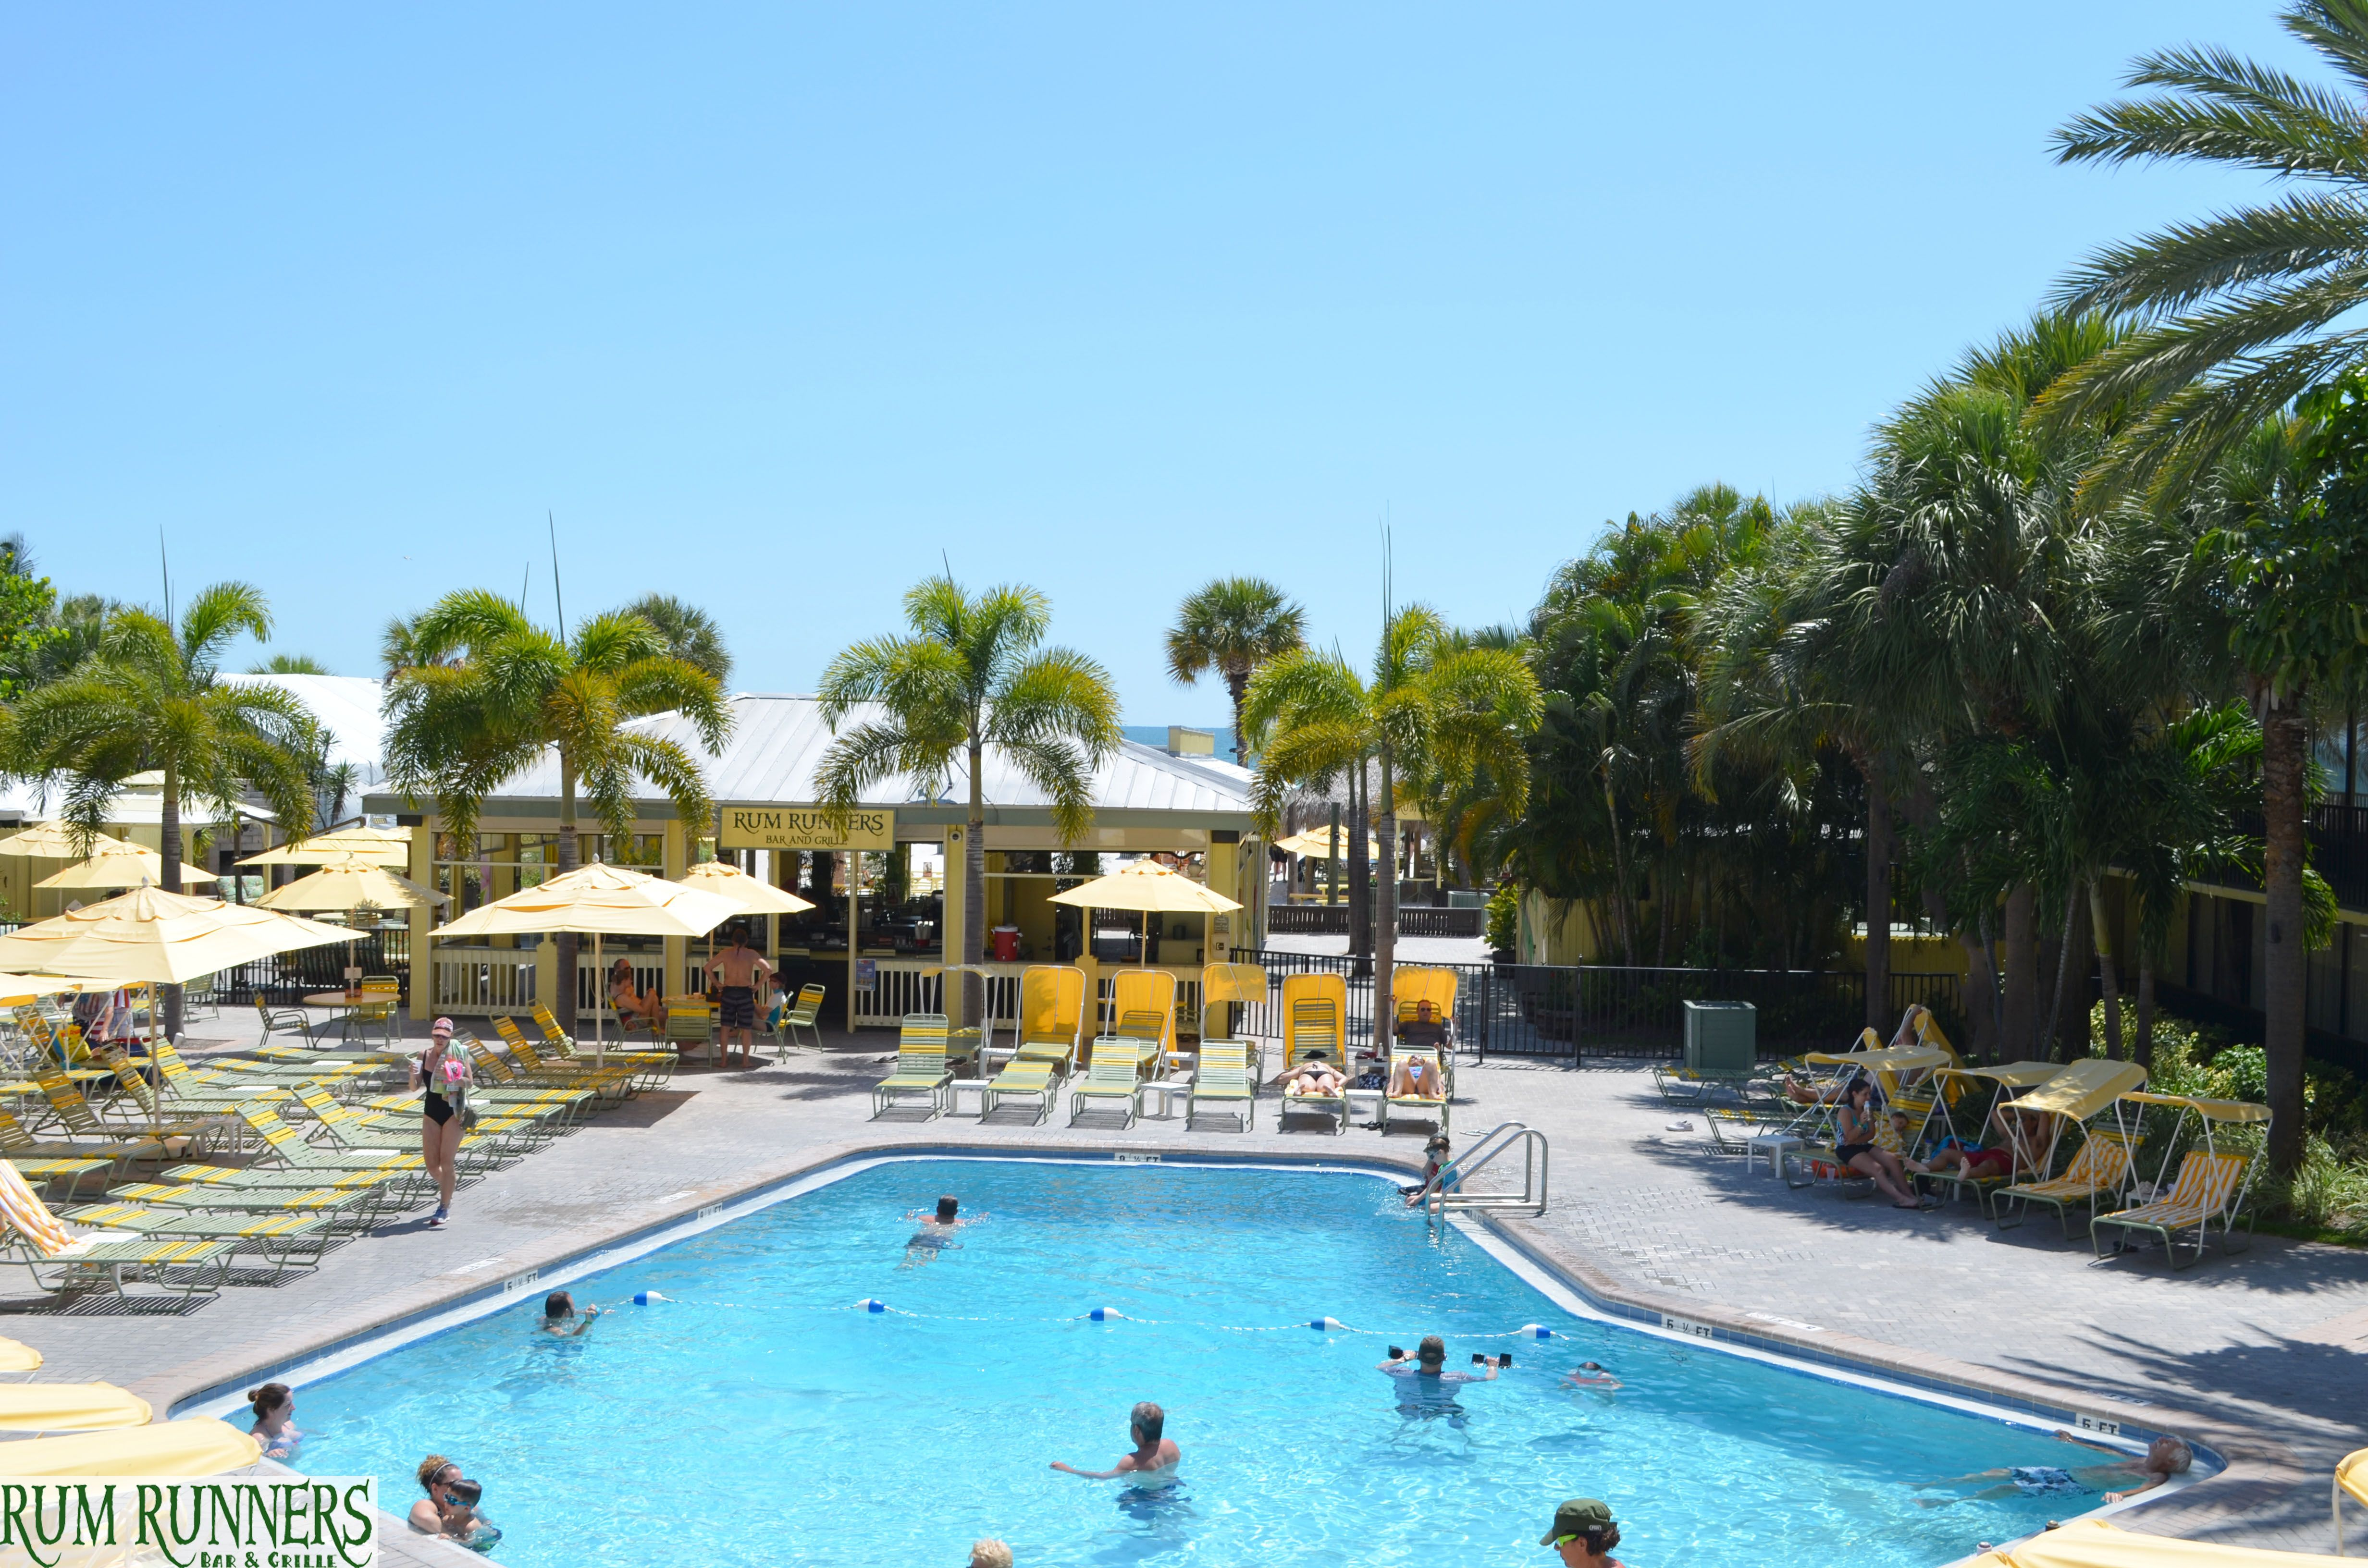 Rum Runners  #Sirata #StPete #Beach #Florida #sun #blue #sky #clouds #fun #family #vacation #trip #relax #lunch #patio #views #hangout #ideas #drinks #rumrunner